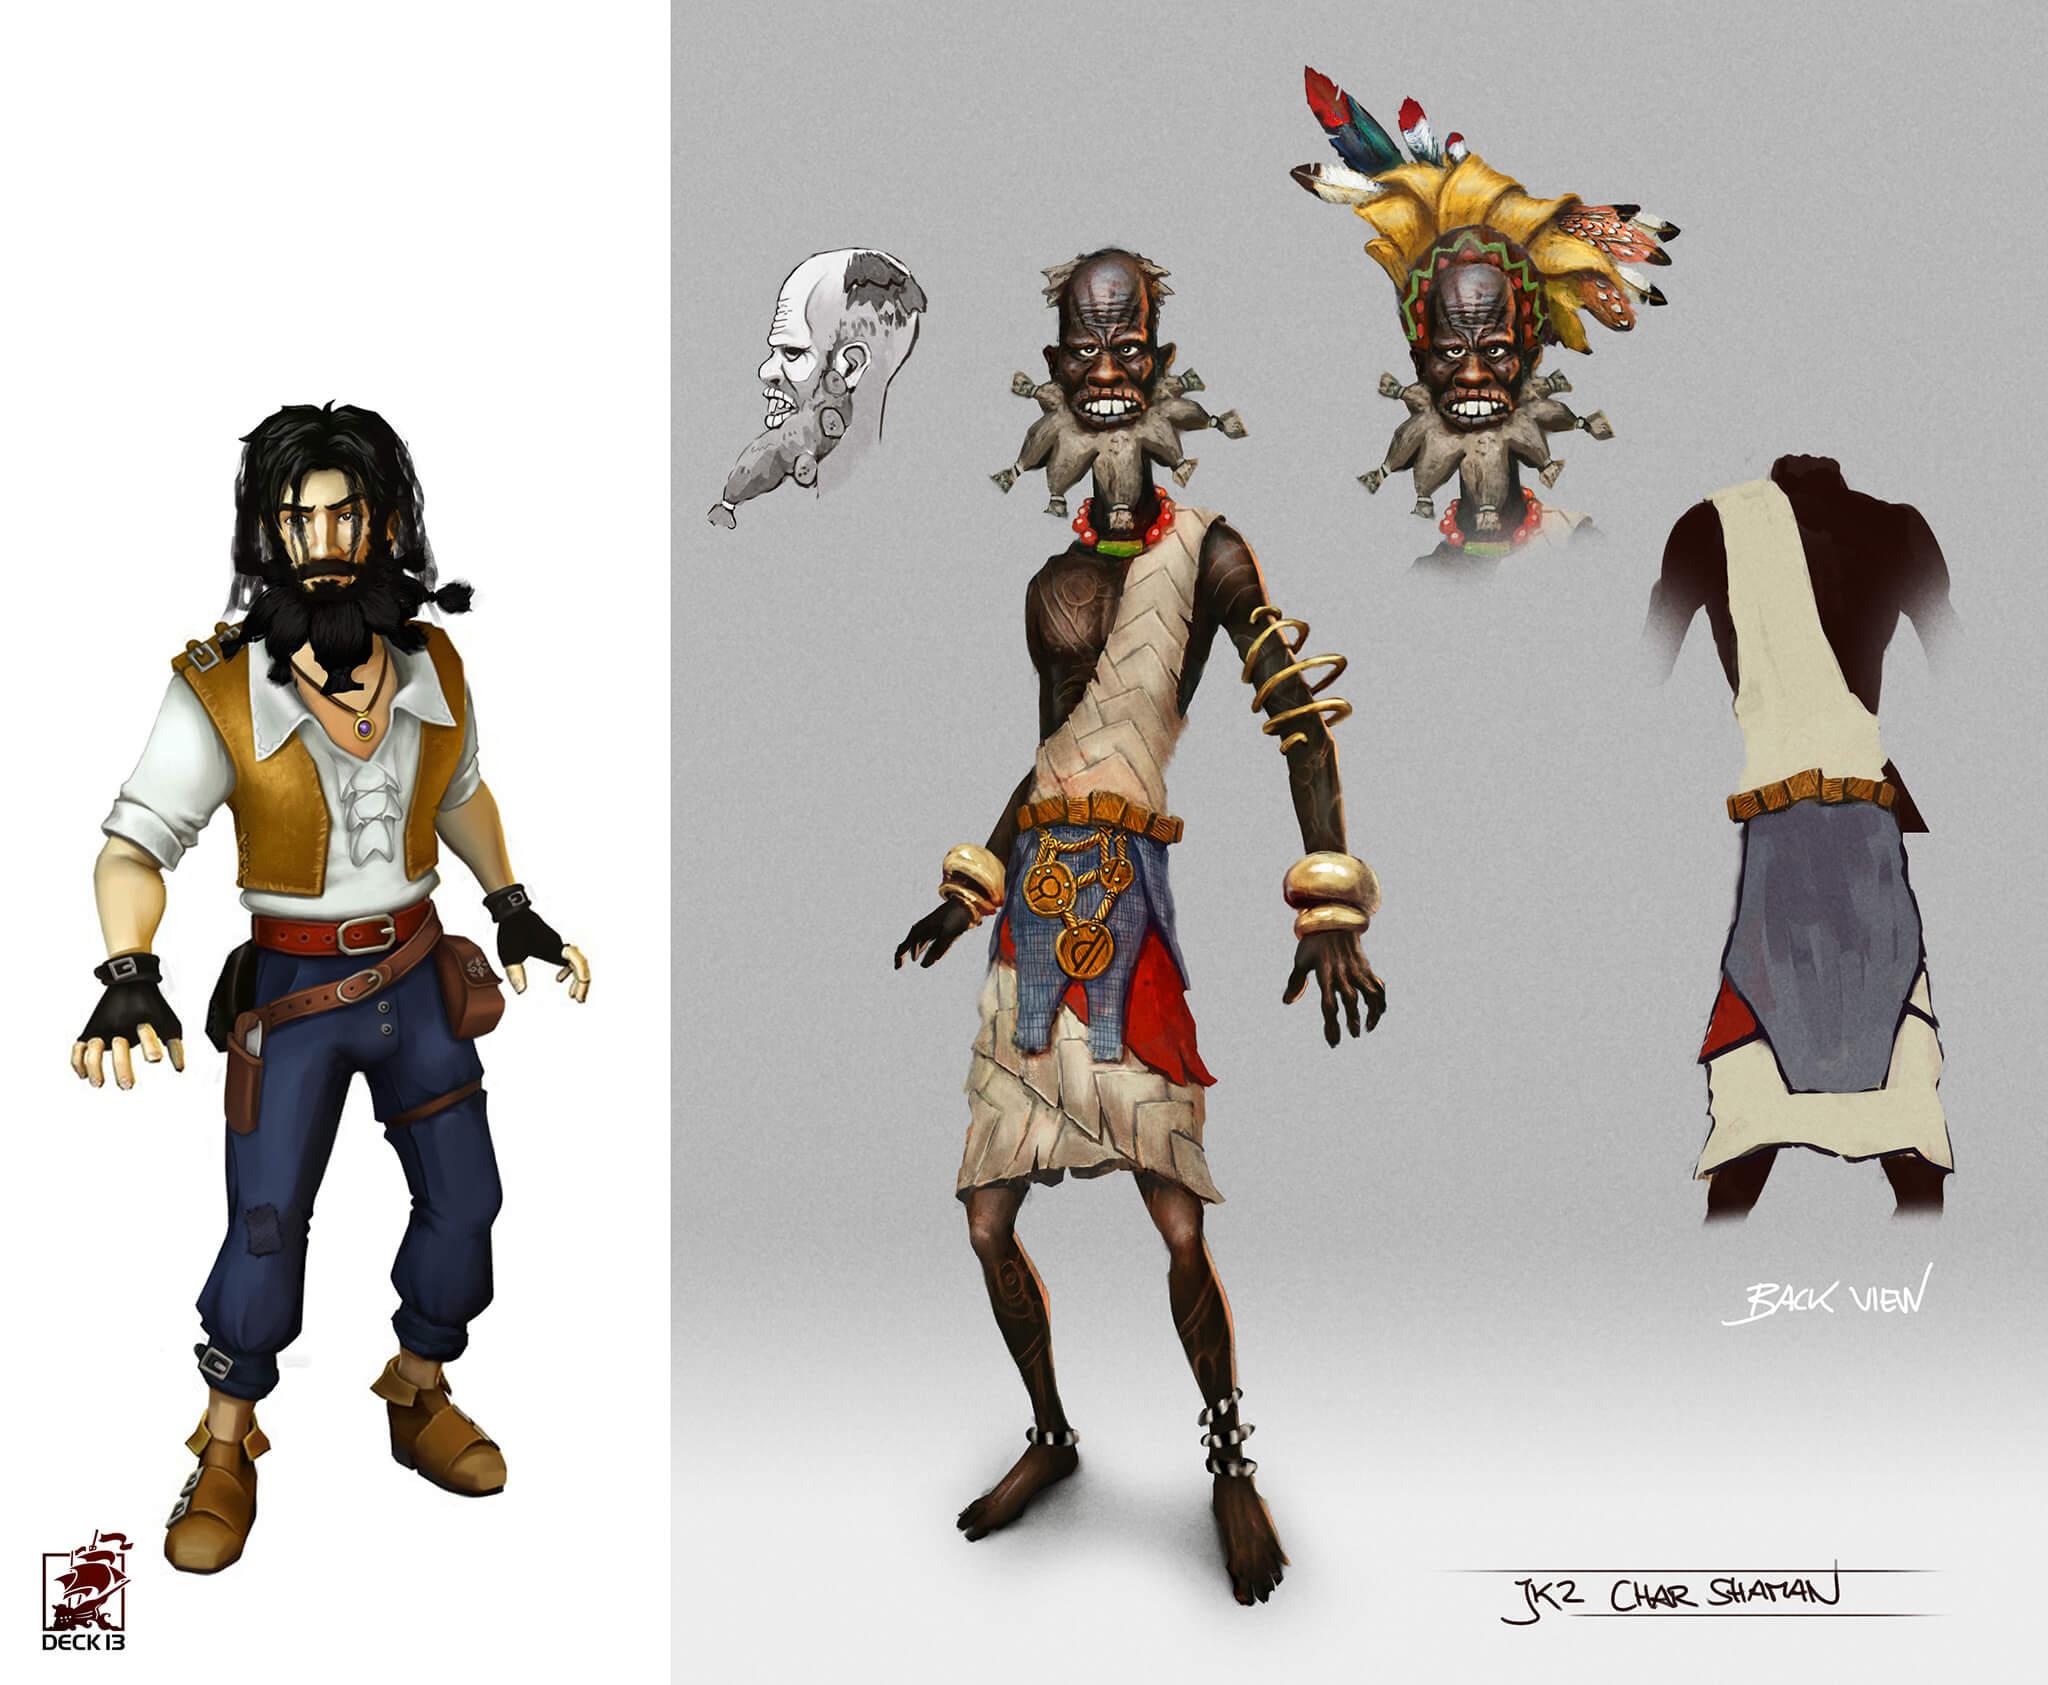 jack-keane-2-deck13-concept-art-felix-botho-haas-char_shaman_005